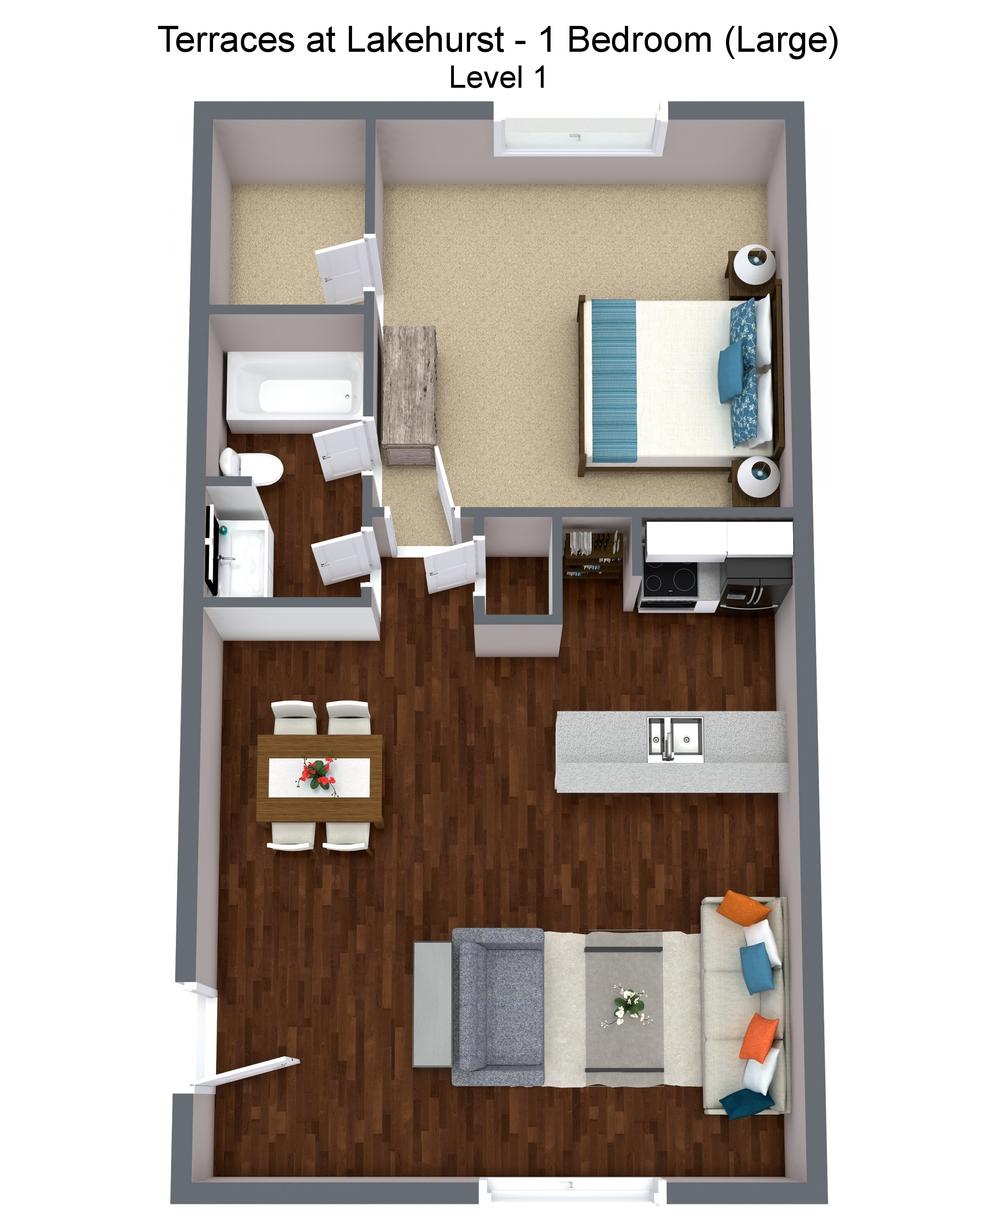 Terraces at Lakehurst - 1 Bedroom (Large) - Level 1 - 3D Floor Plan.png